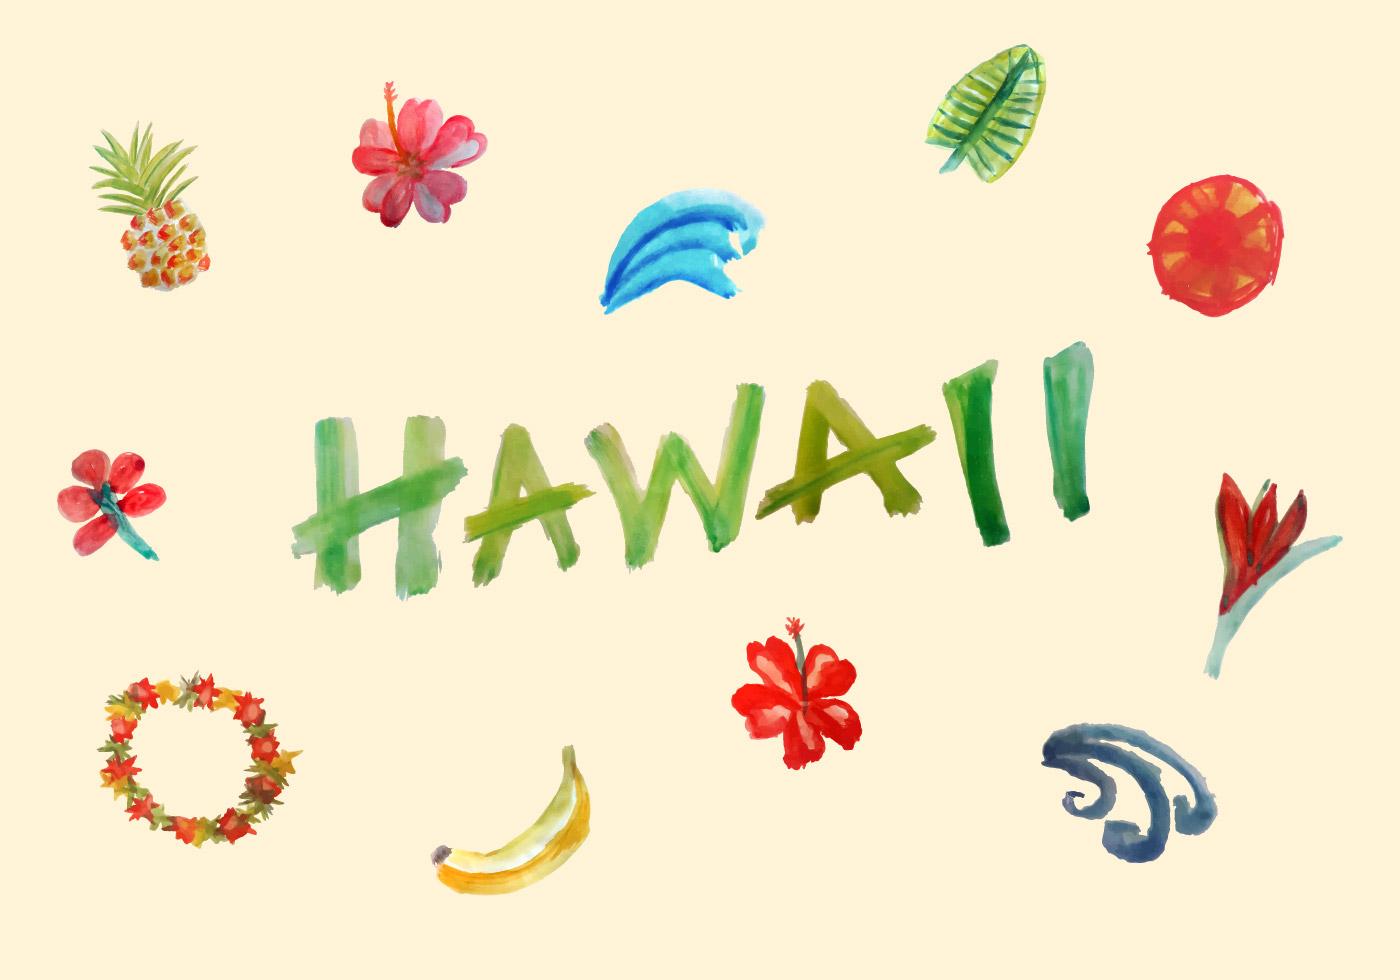 Free Hawaiian Vector Elements - Download Free Vector Art, Stock Graphics & Images